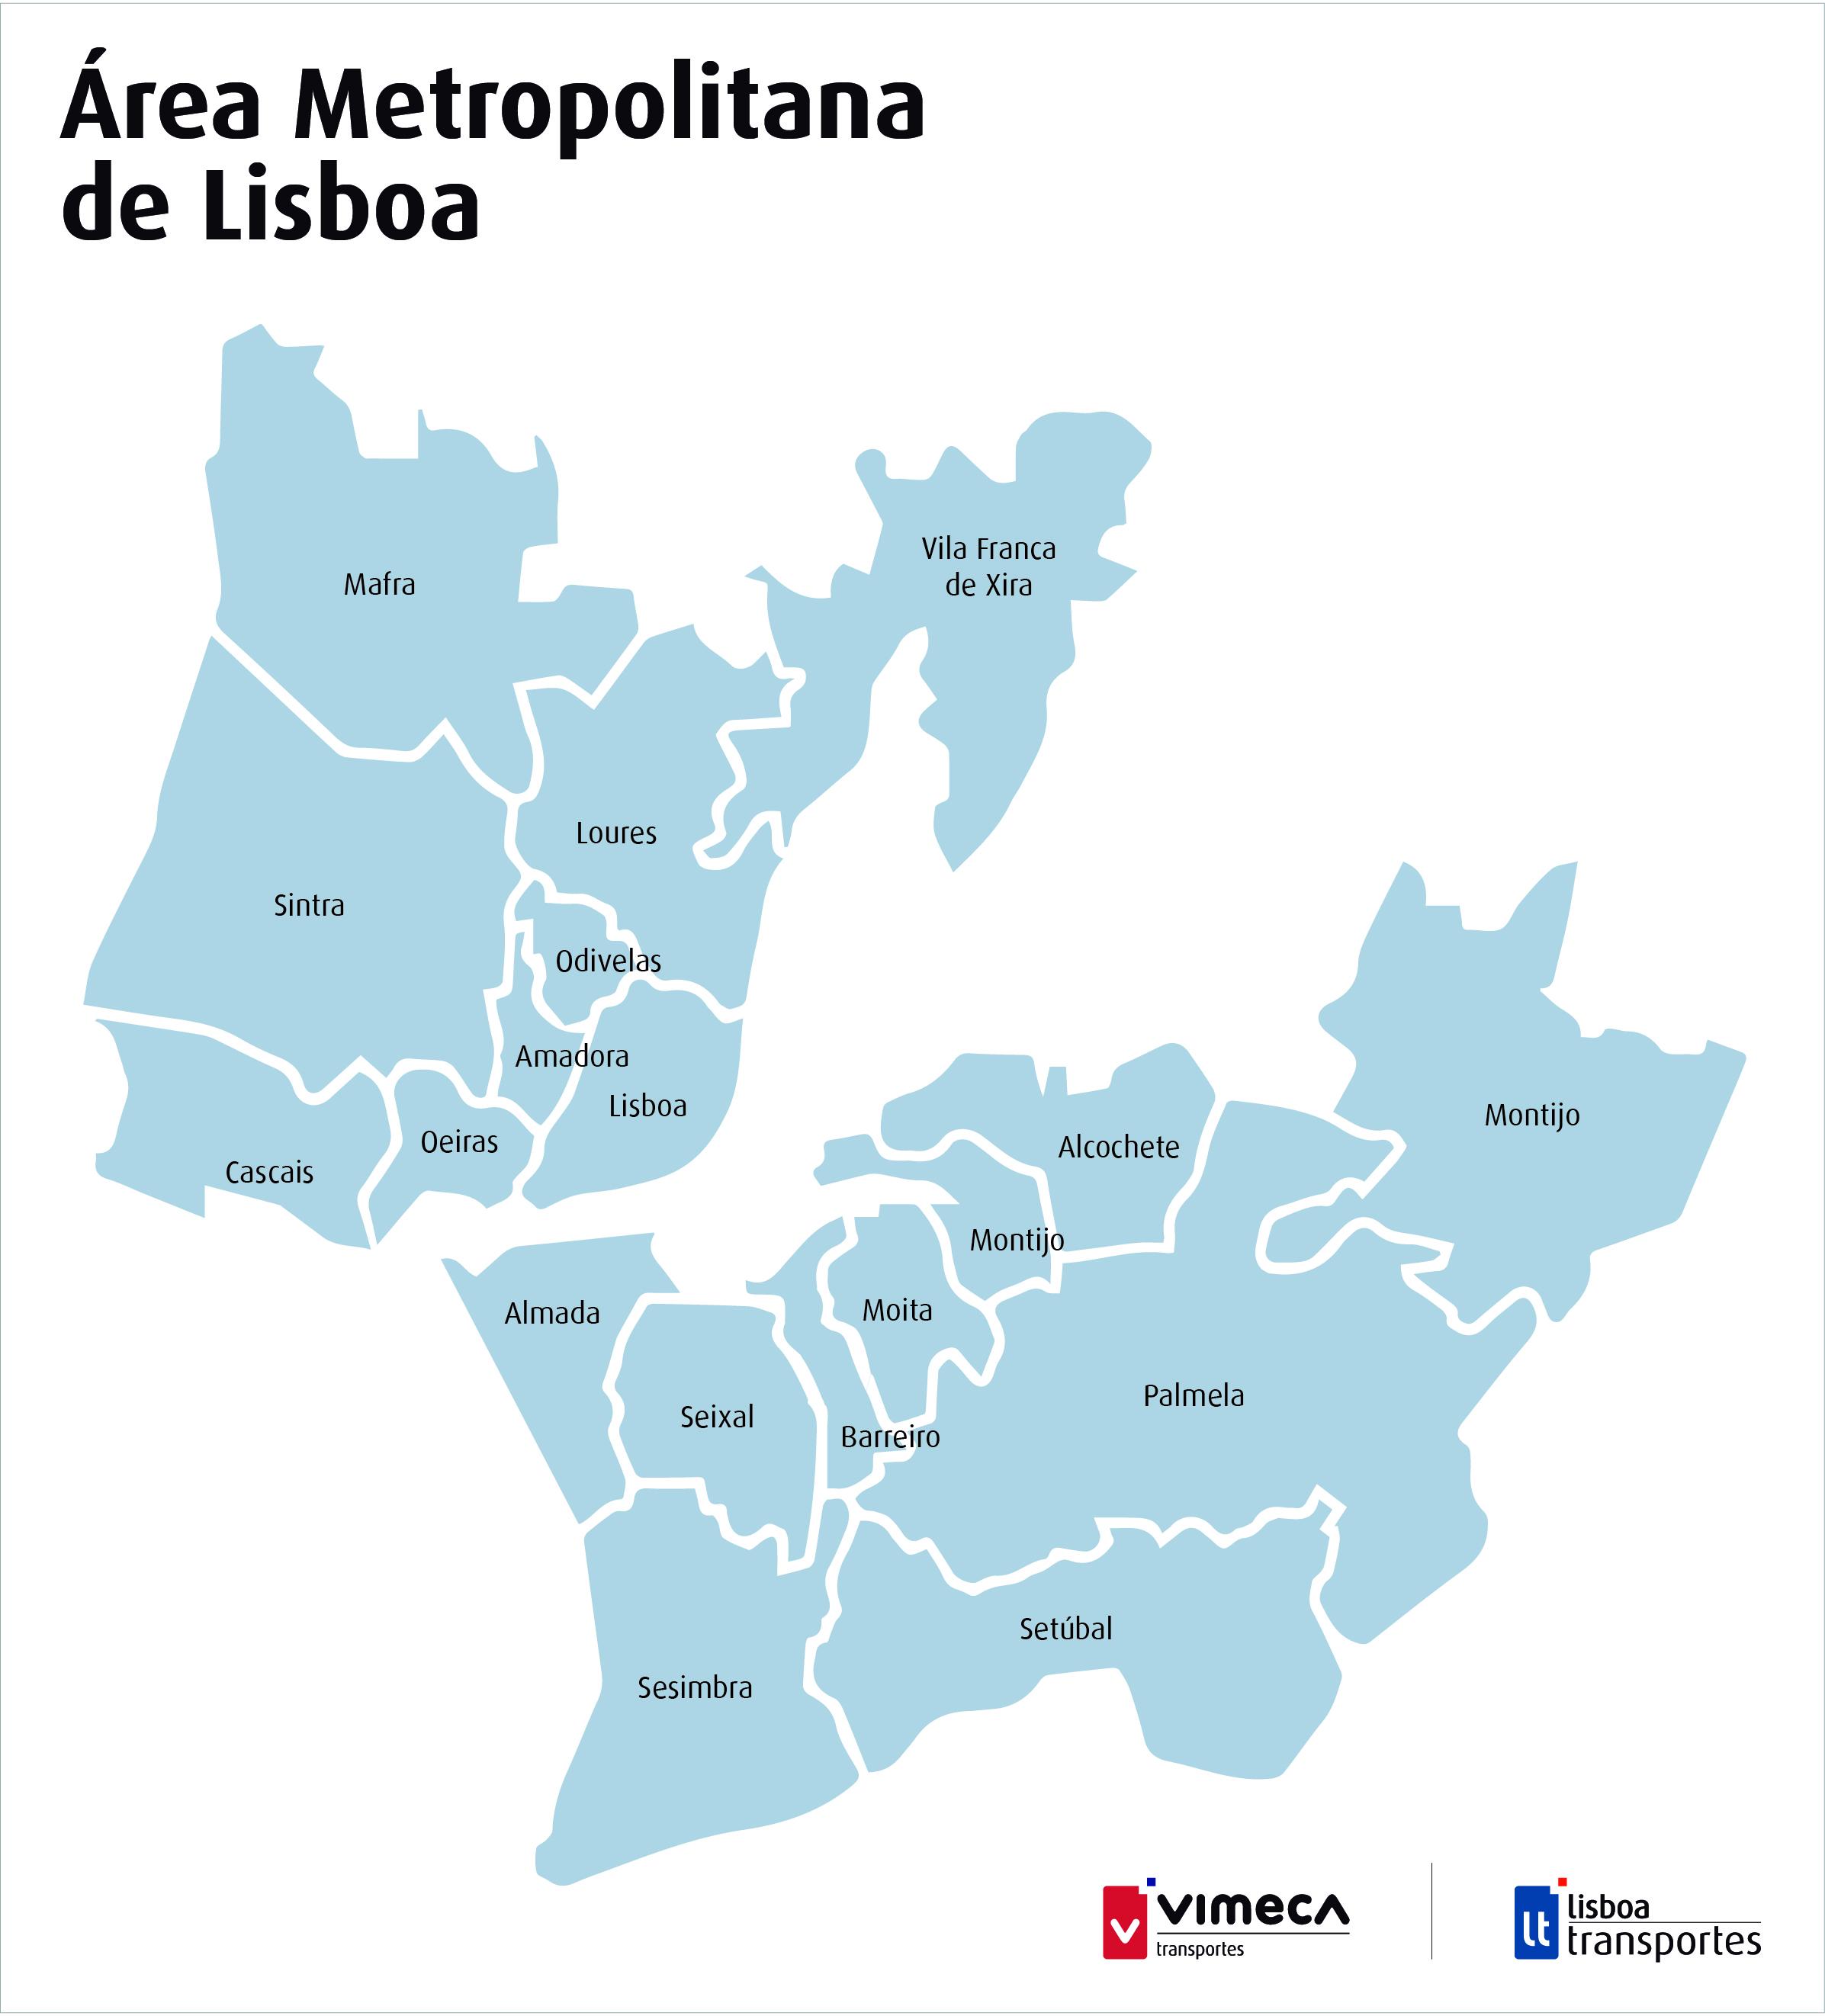 Area Metropolitana De Lisboa